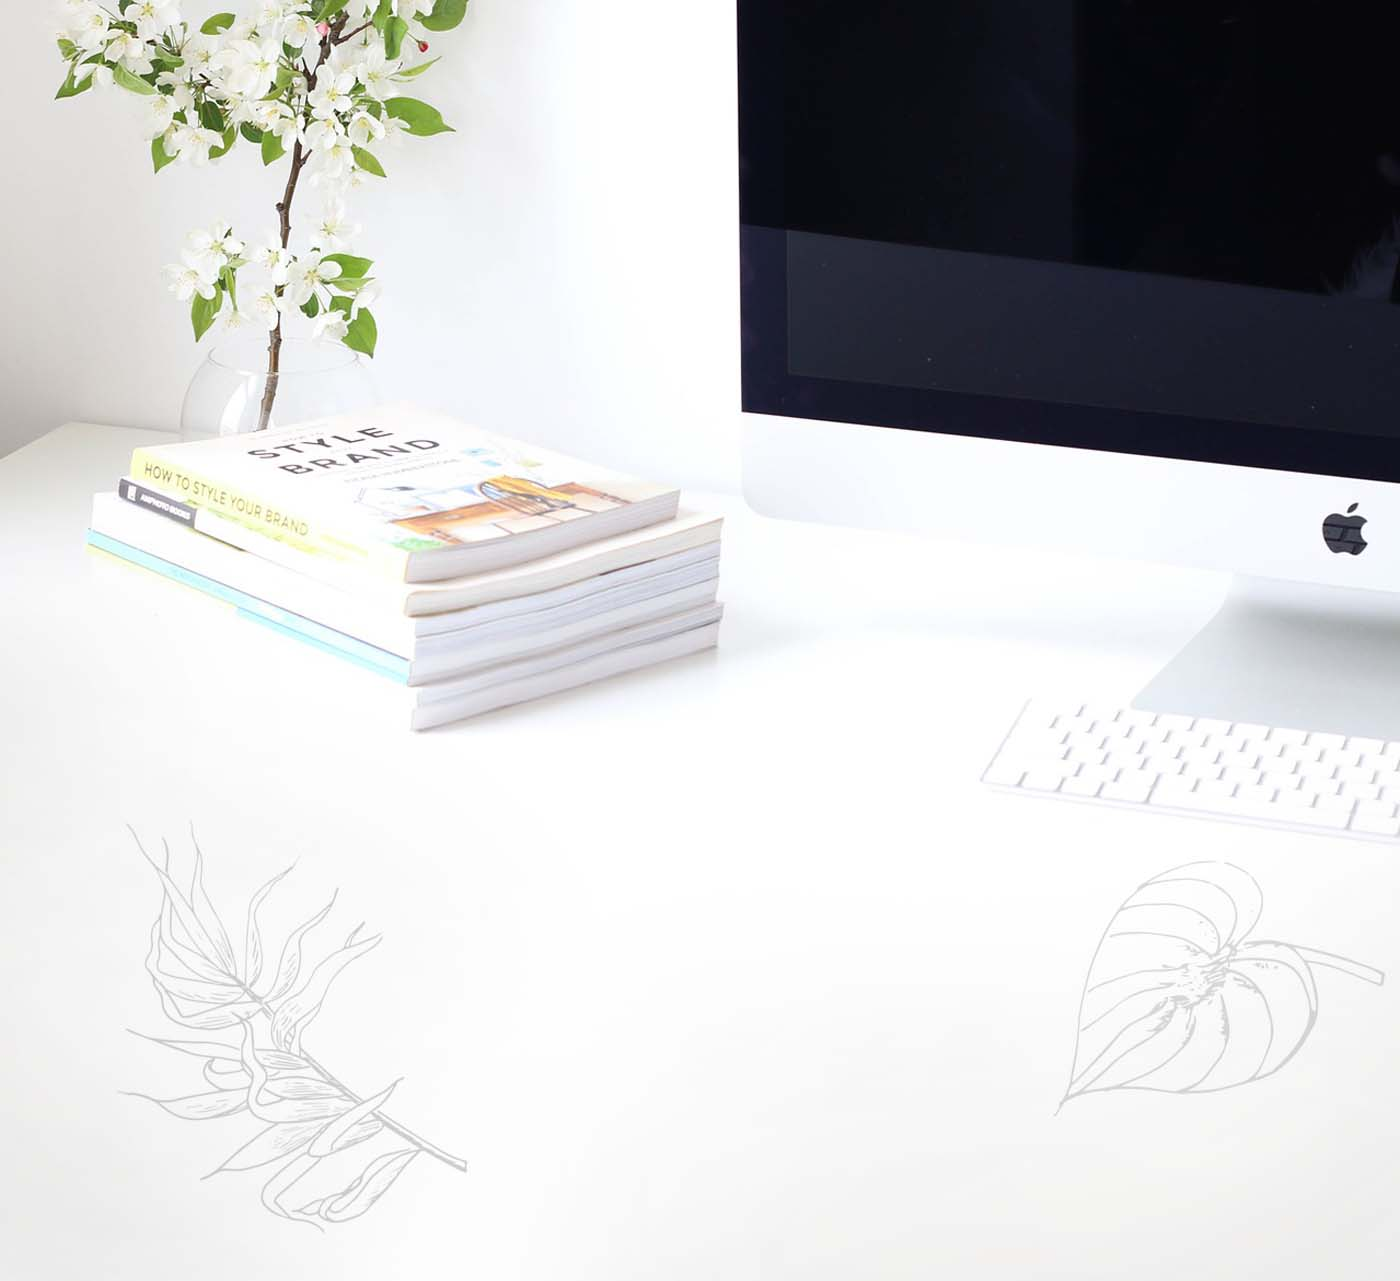 Kreativ-Fee_Kommunikationsdesign_Freie Mitarbeit Freelance